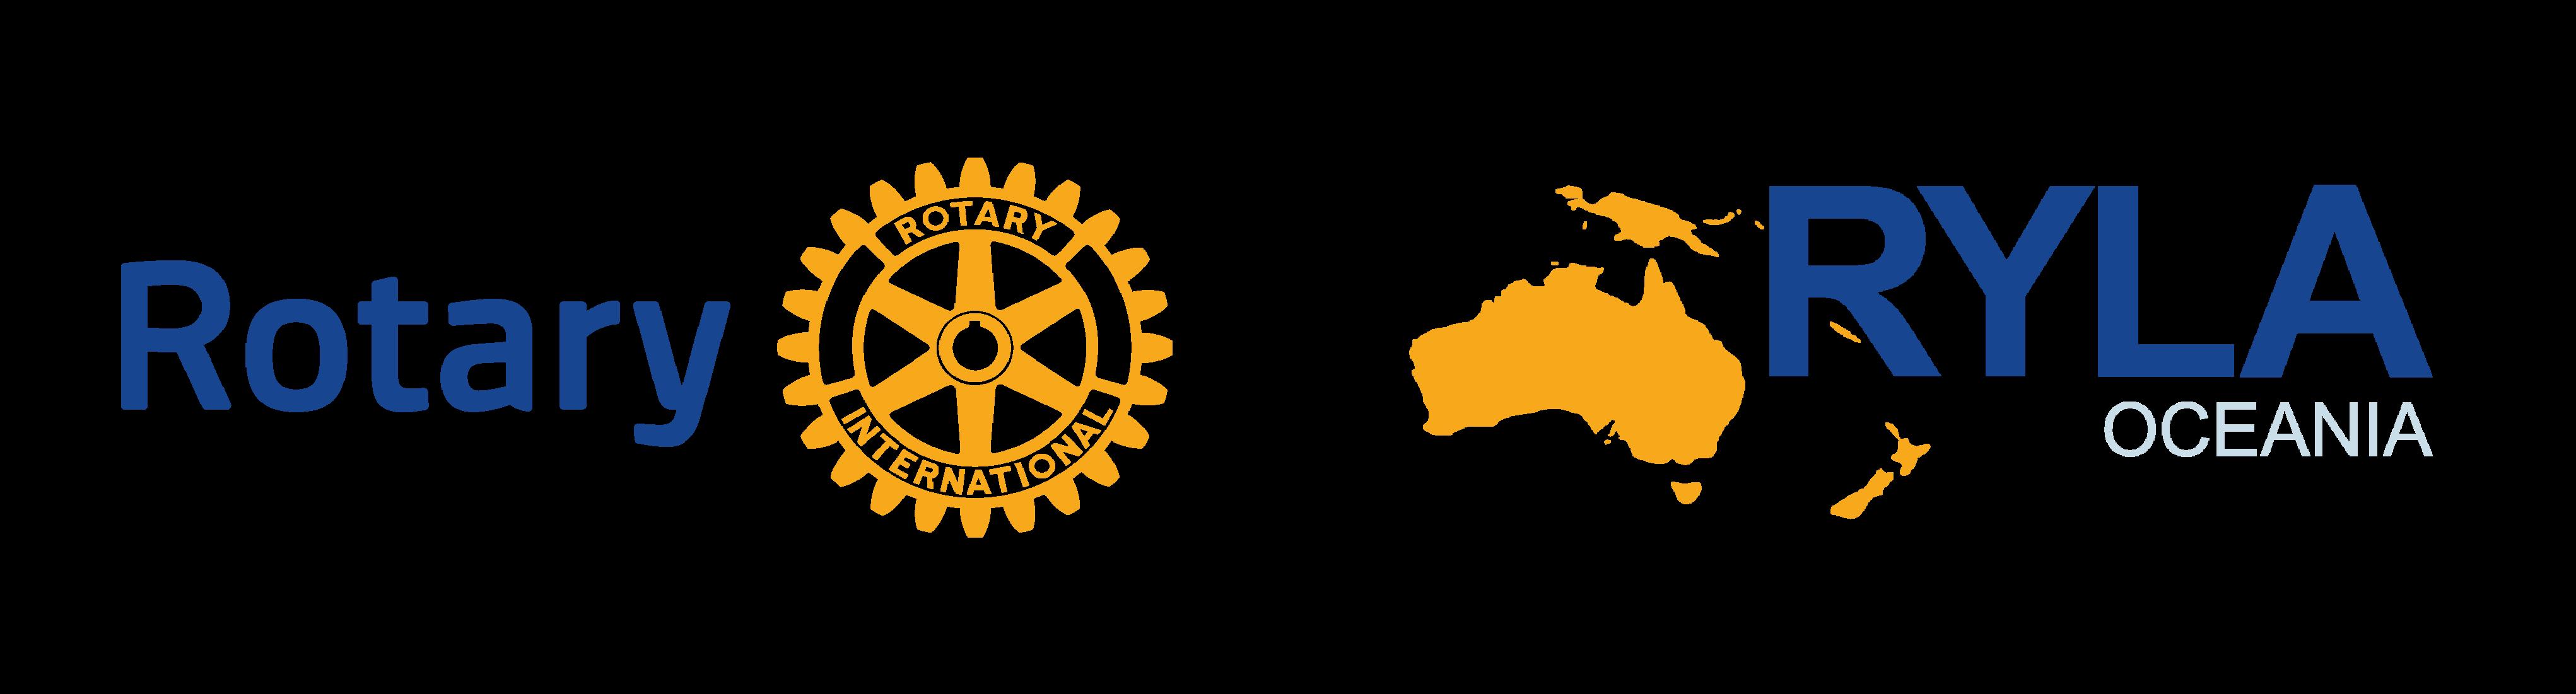 RYLA Oceania